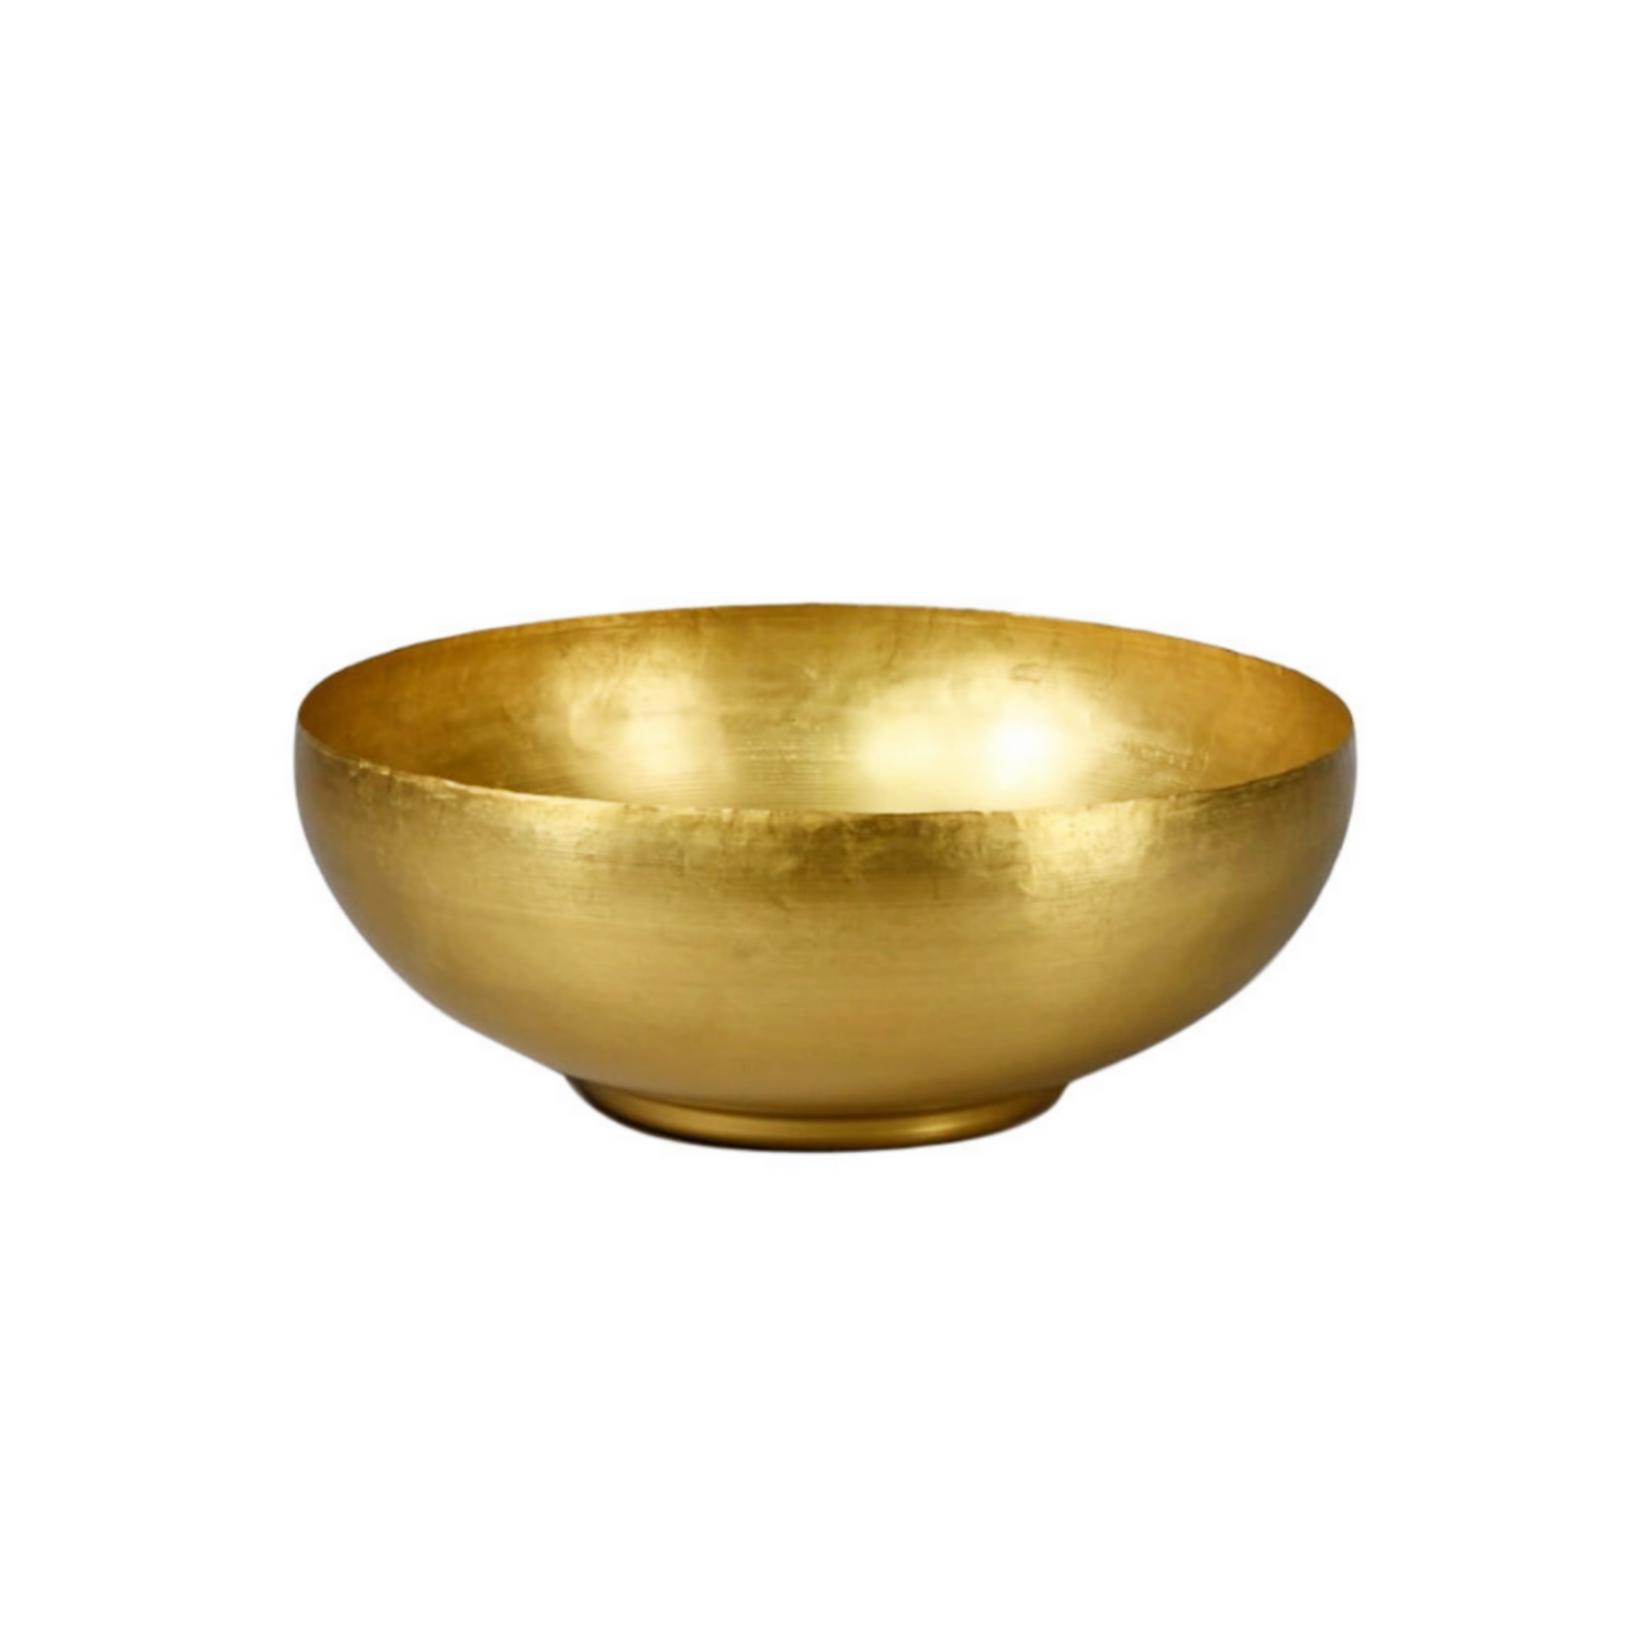 Wyld Blue Home Antique Raw Brass Bowl